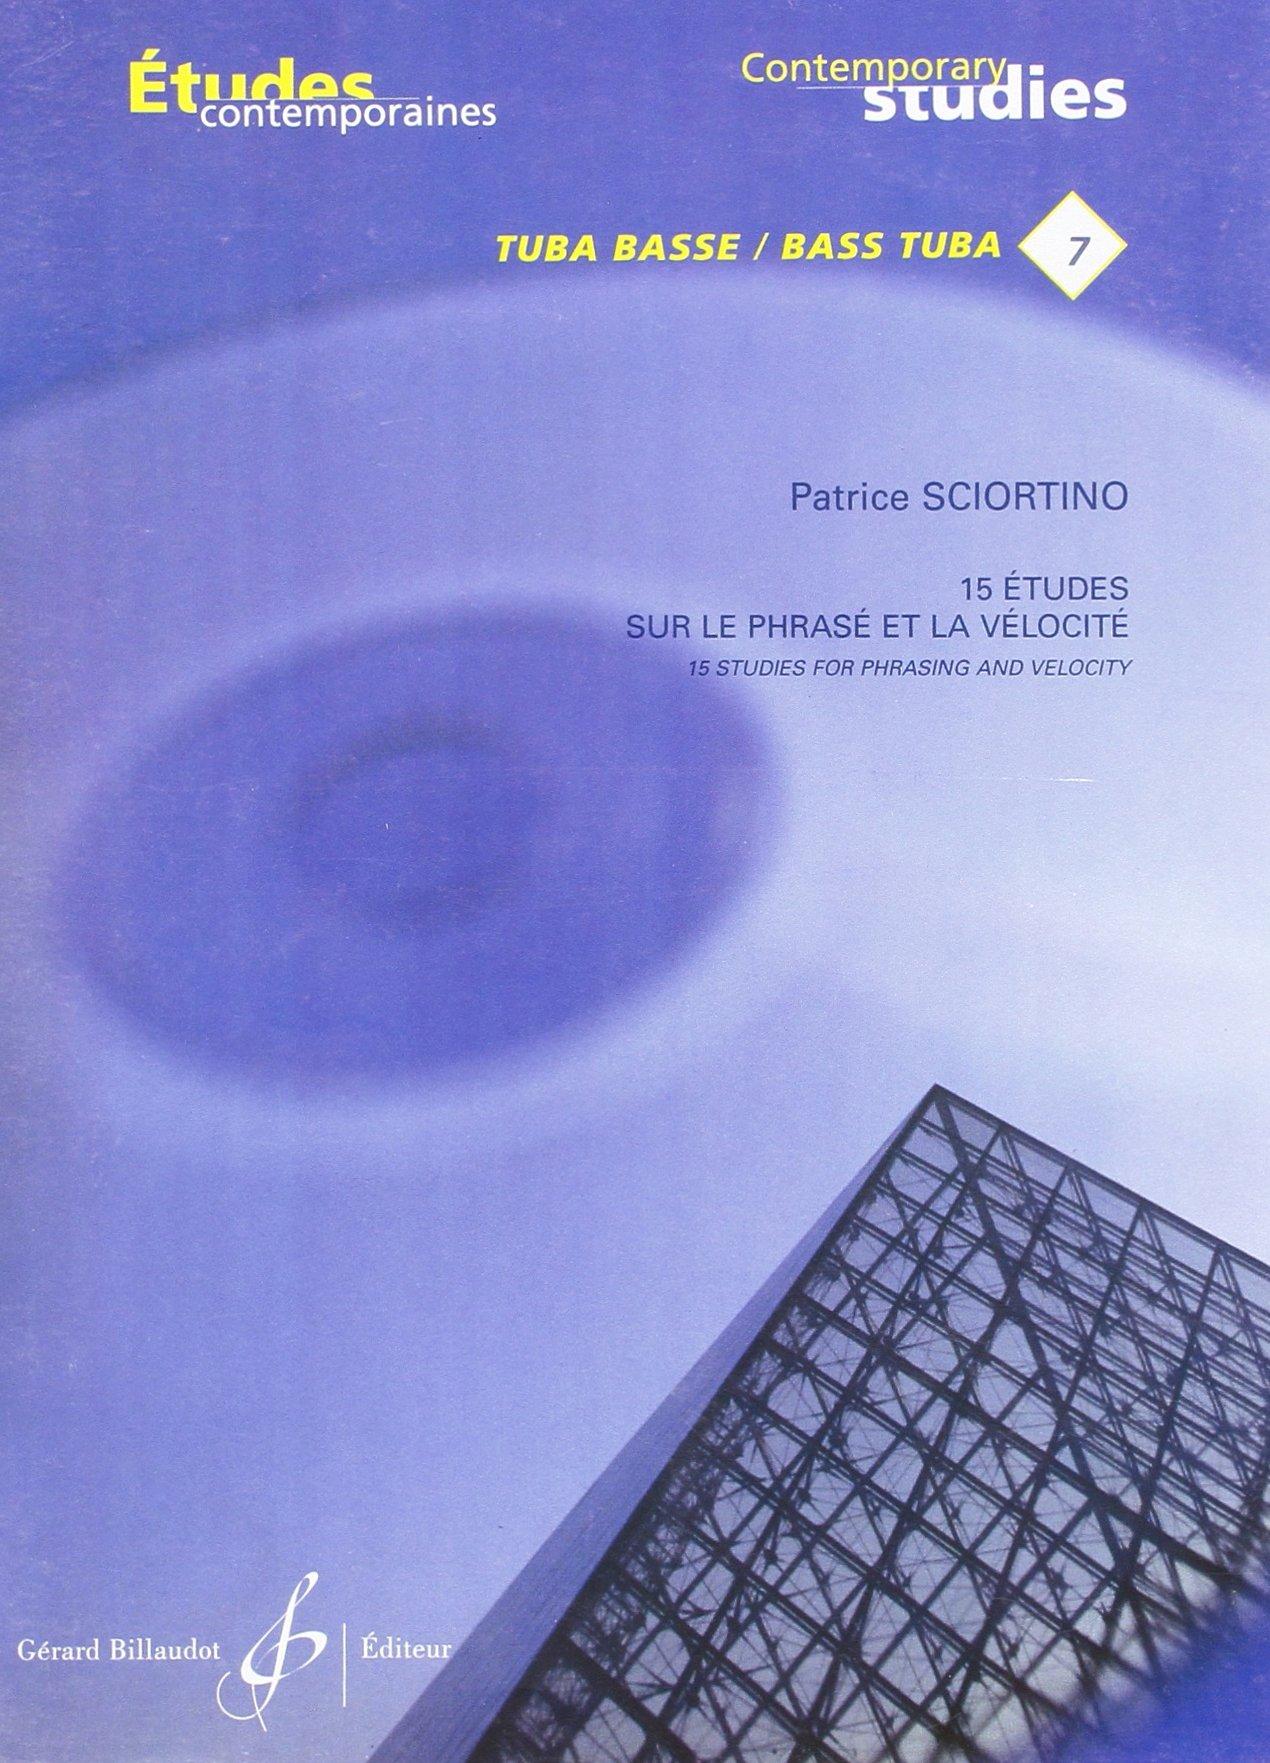 15 Etudes de Phrase et de Velocite Tuba Basse Taschenbuch – 30. April 2010 Sciortino Patrice Billaudot B003JYOSWK